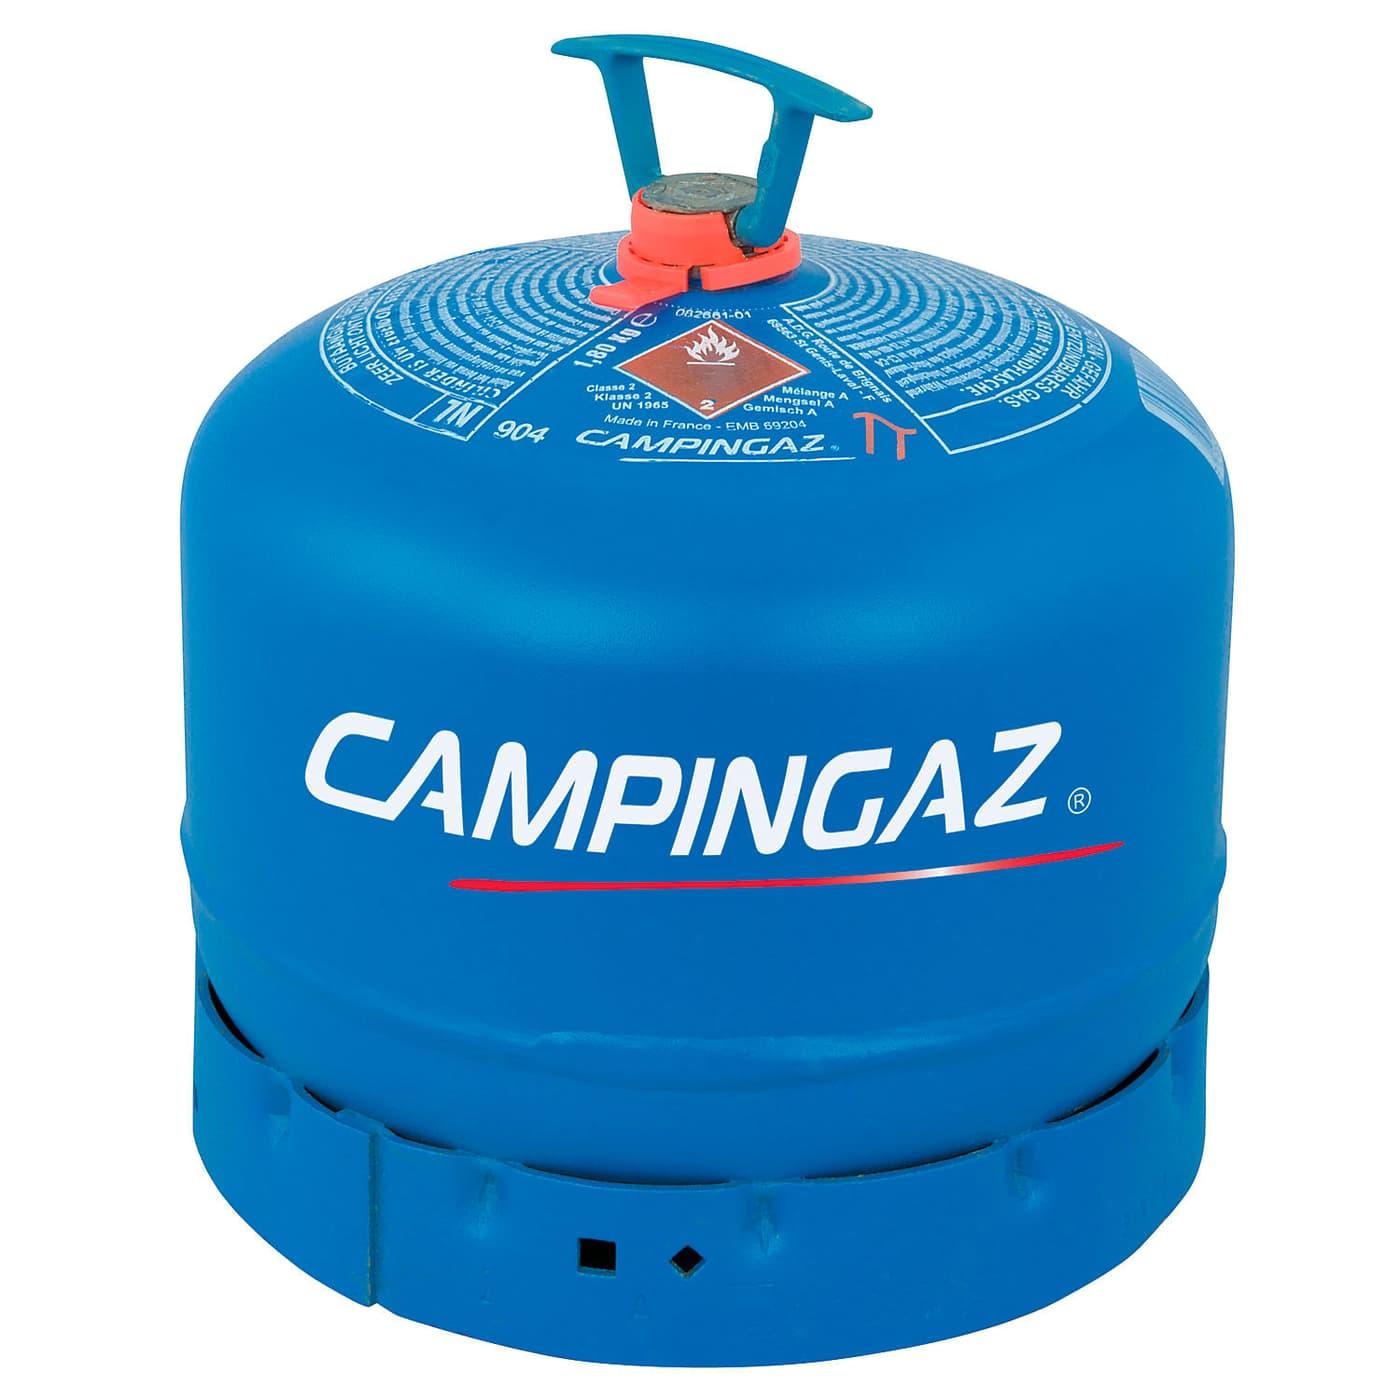 Campingaz recharge de gaz butane 4 l migros - Recharge camping gaz ...